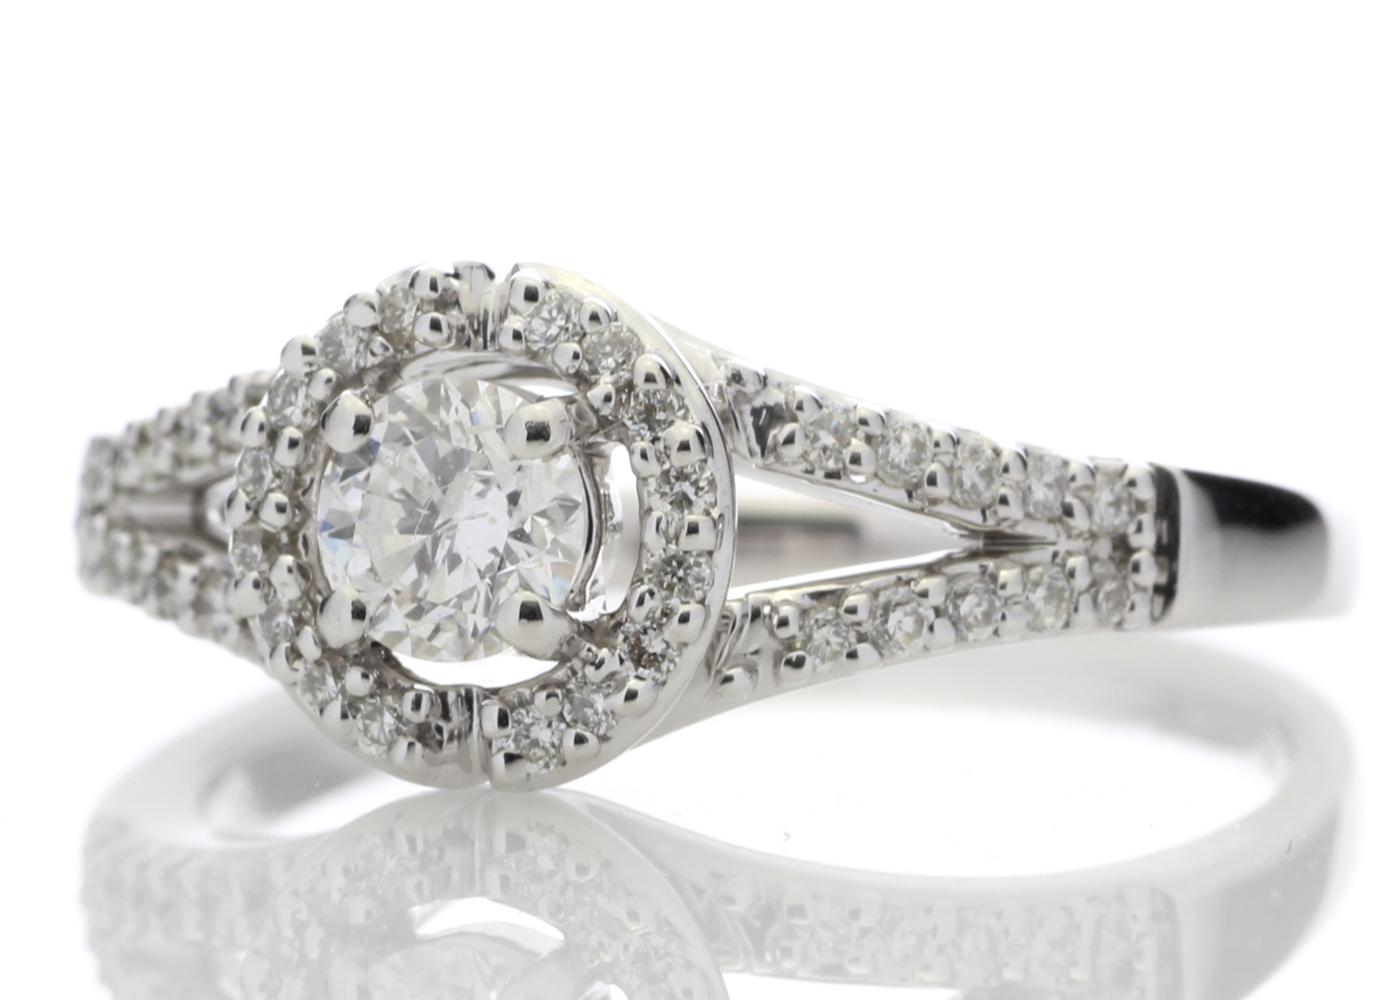 18ct White Gold Halo Set Diamond Ring 0.54 Carats - Image 2 of 4